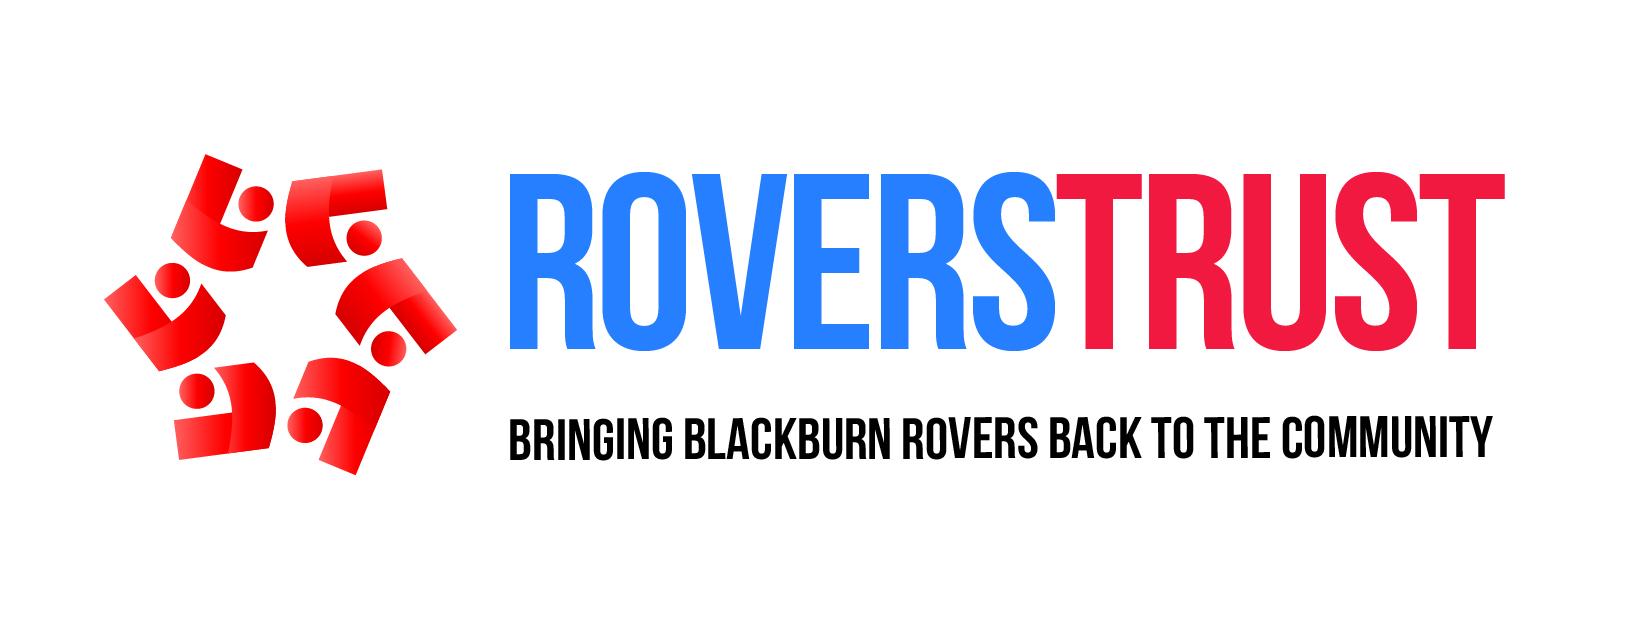 Rovers Trust Logo Draft 3 01 E1380919908152